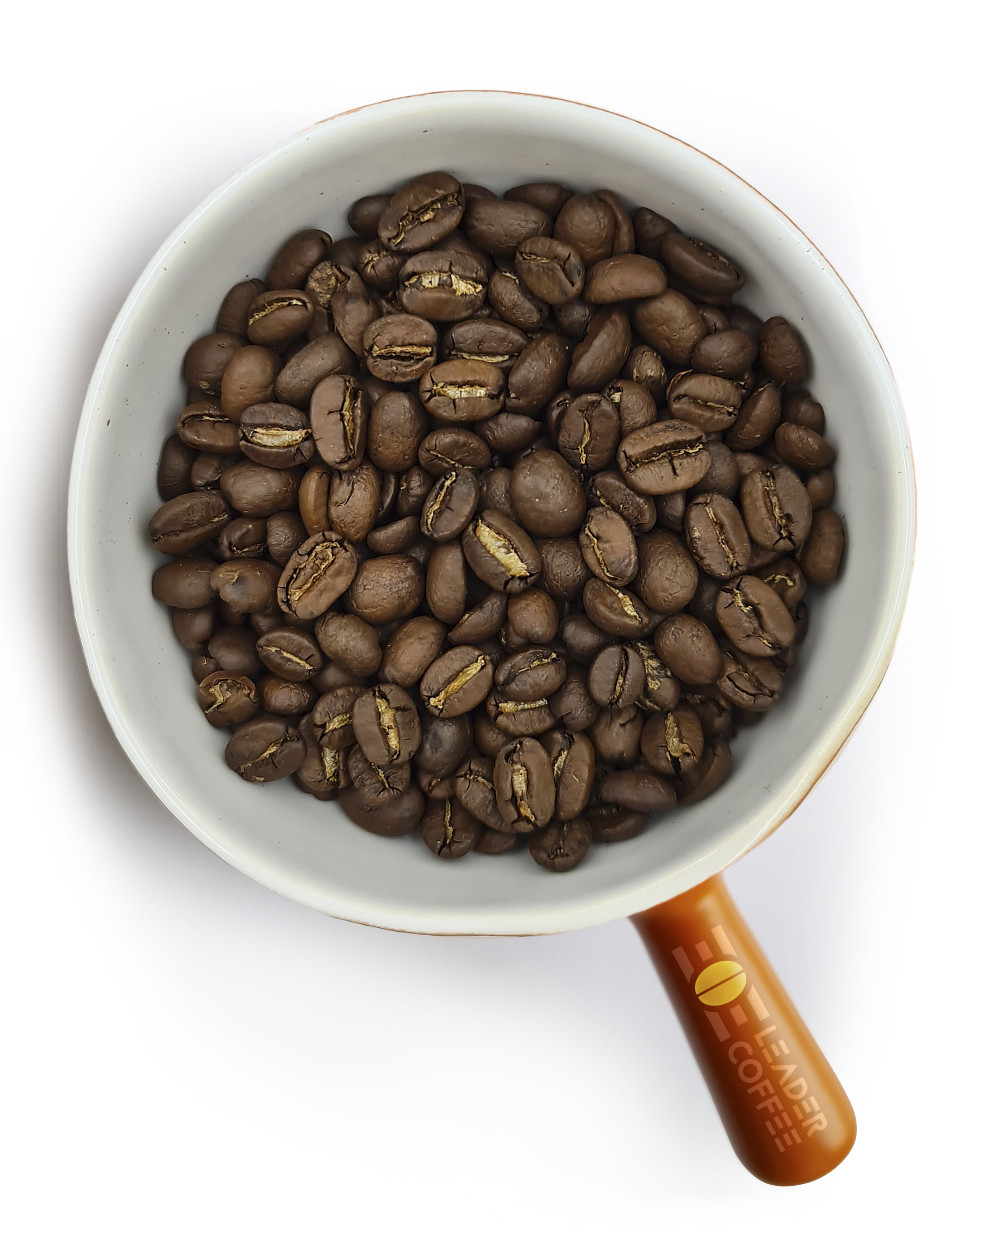 Кофе в зернах Арабика Никарагуа SHG, мешок 20кг